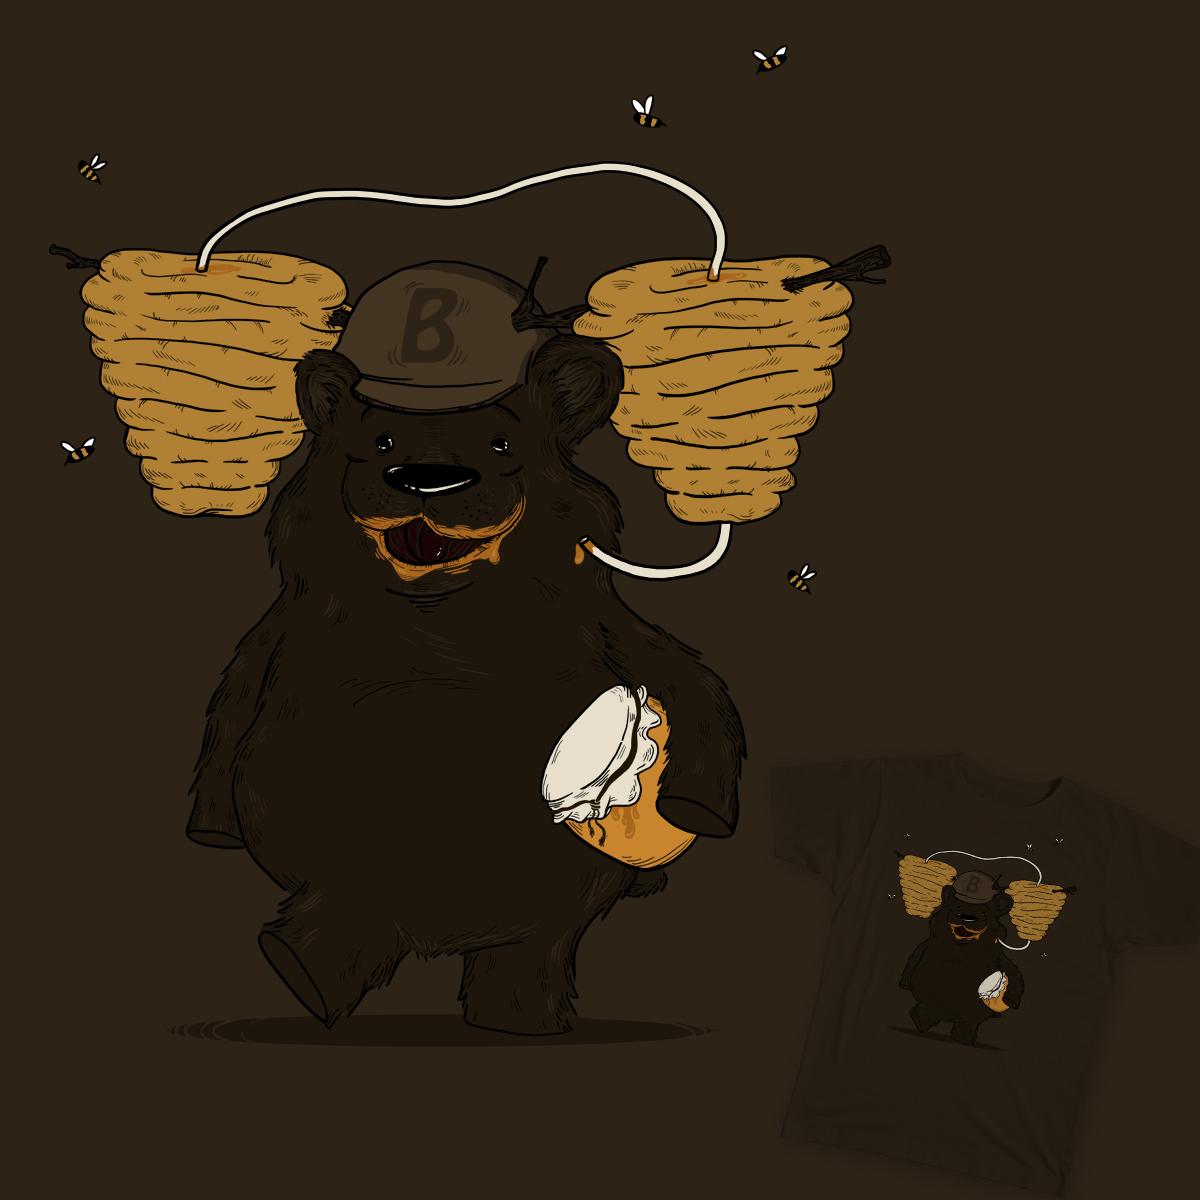 B hat - every bear's wish by LILMAUI on Threadless